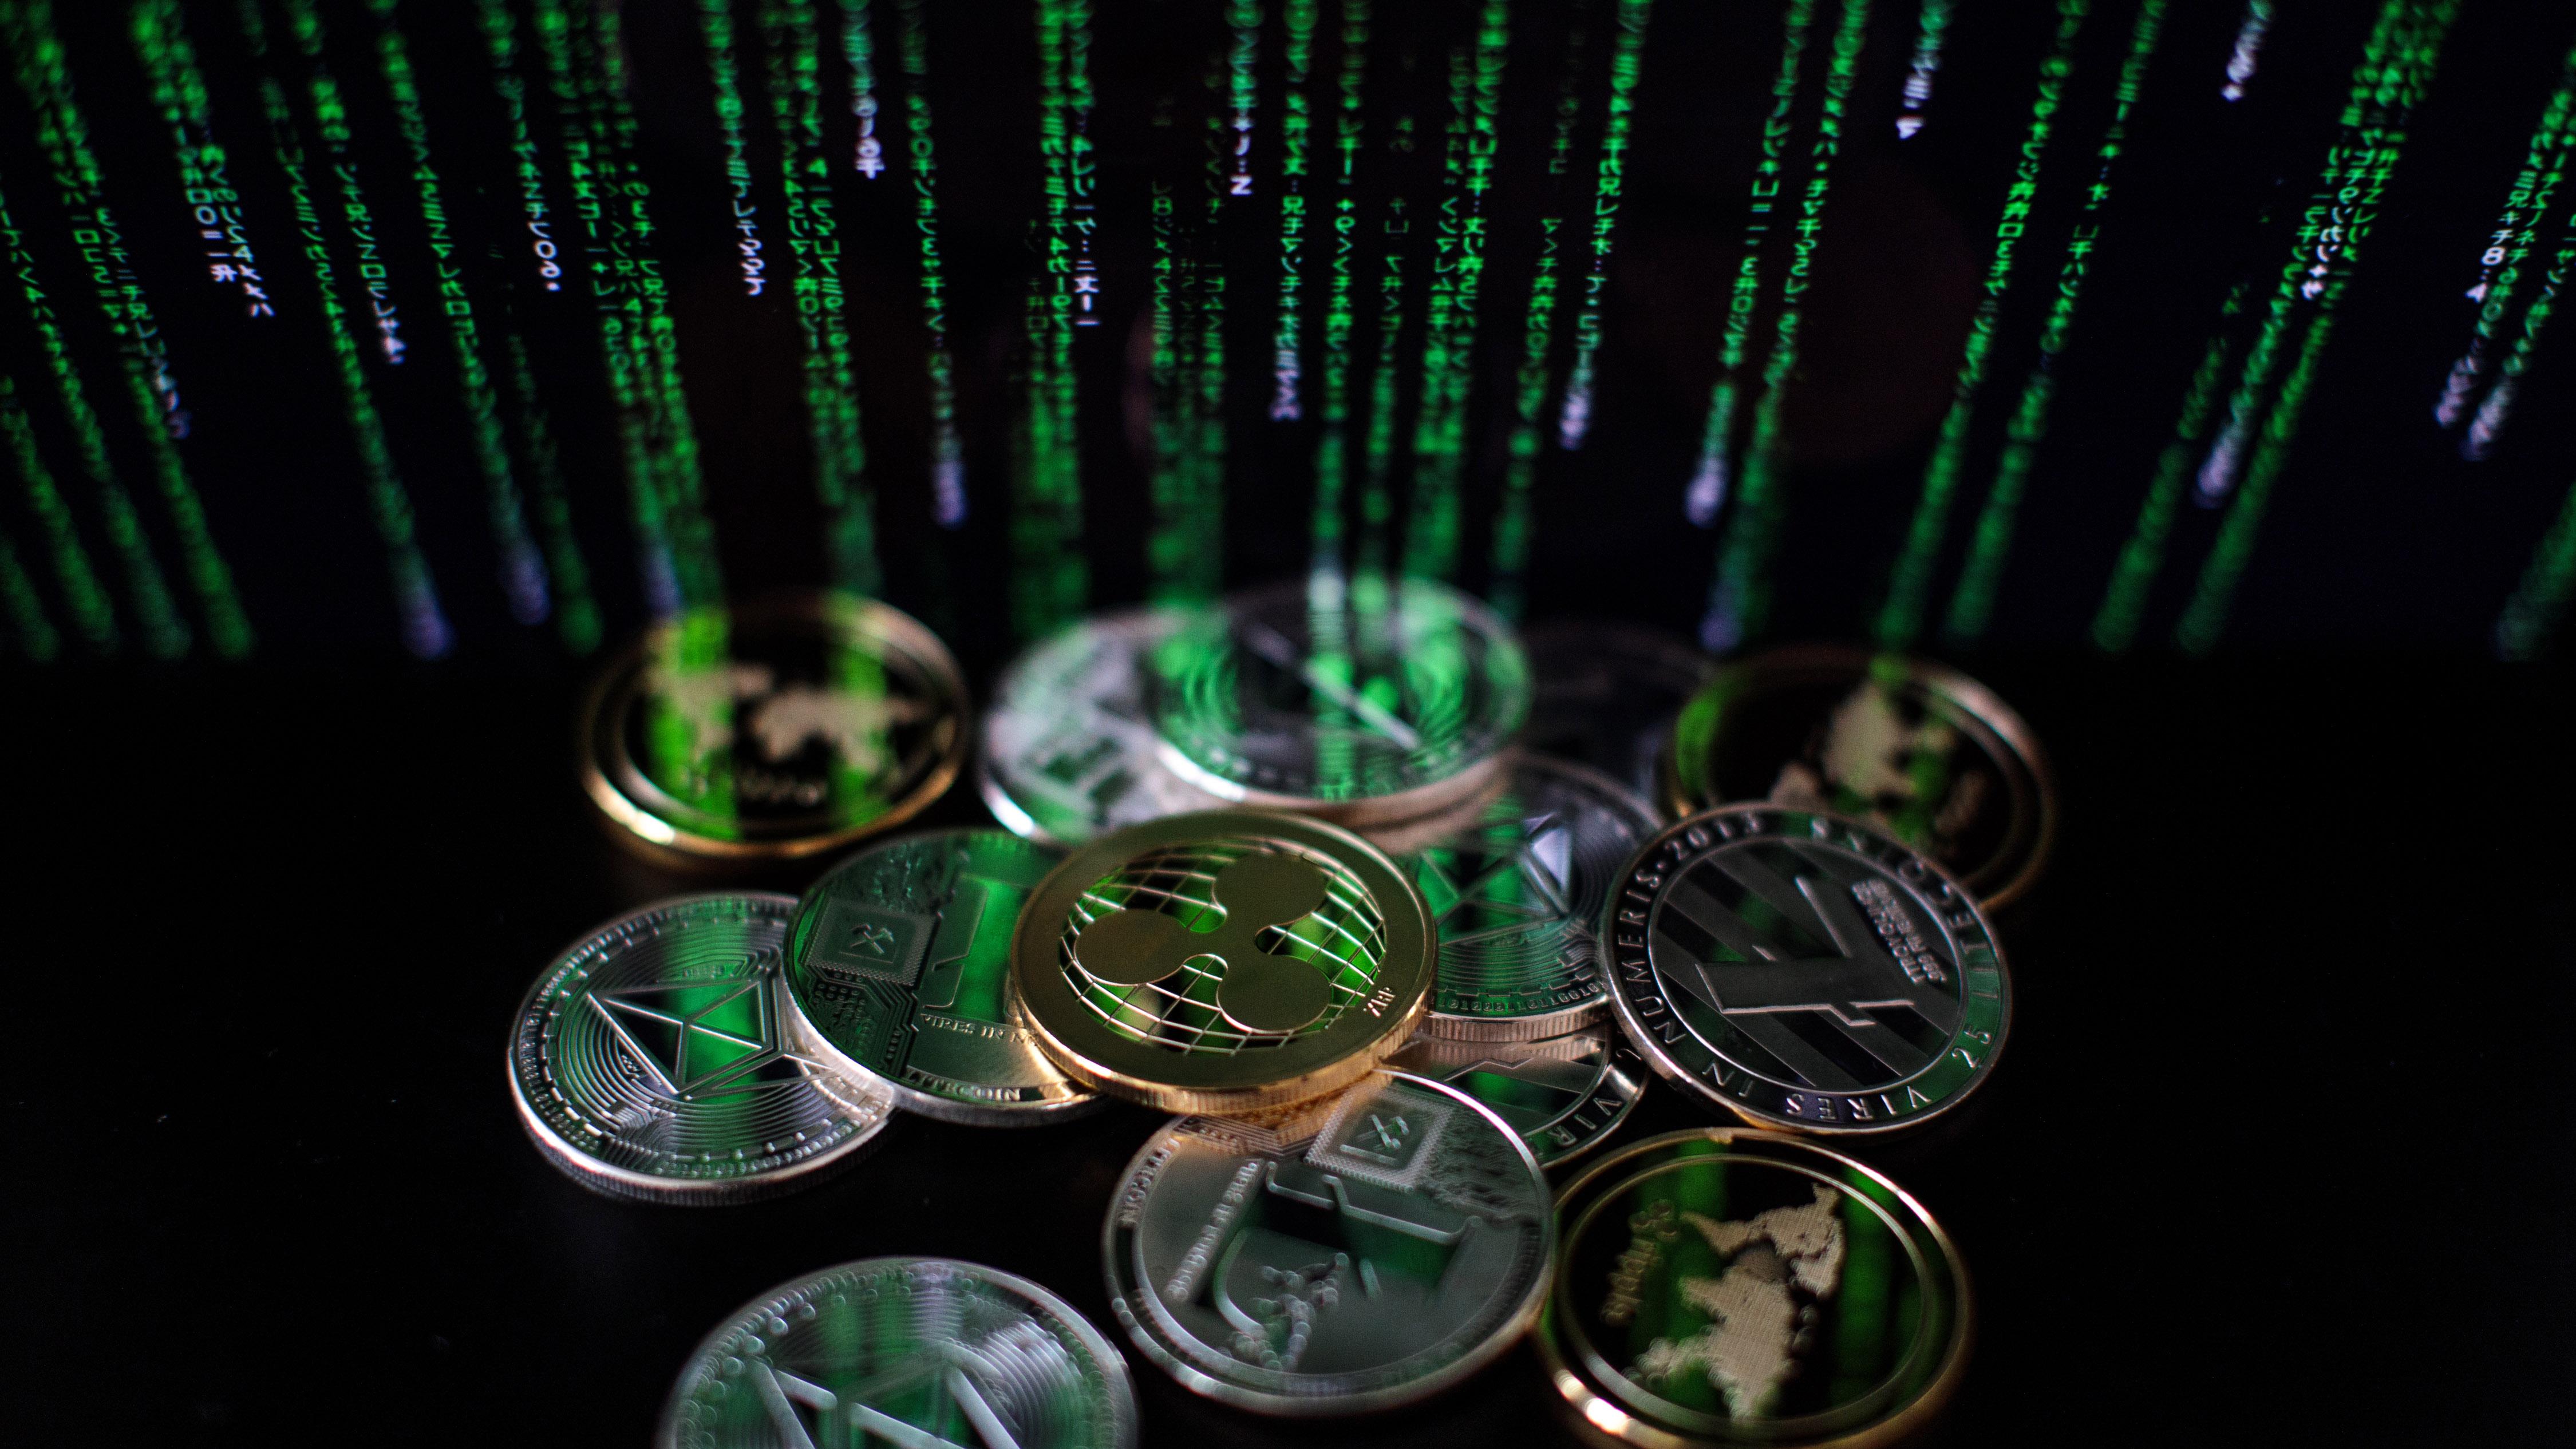 China will likely ban all bitcoin mining soon - Ars Technica